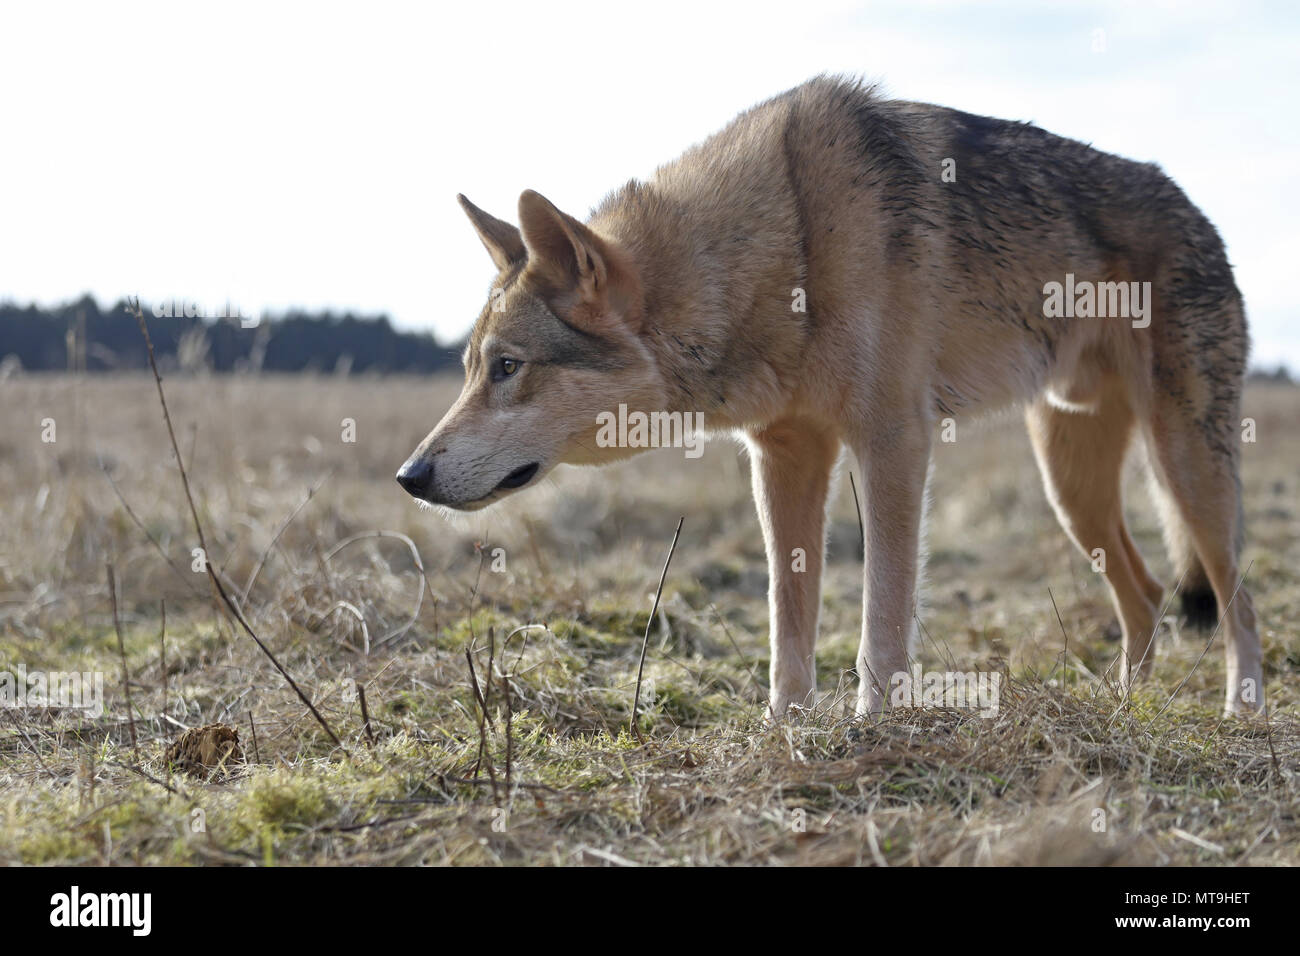 Czechoslovakian Wolfdog. Adult dog standing on a meadow. Germany - Stock Image